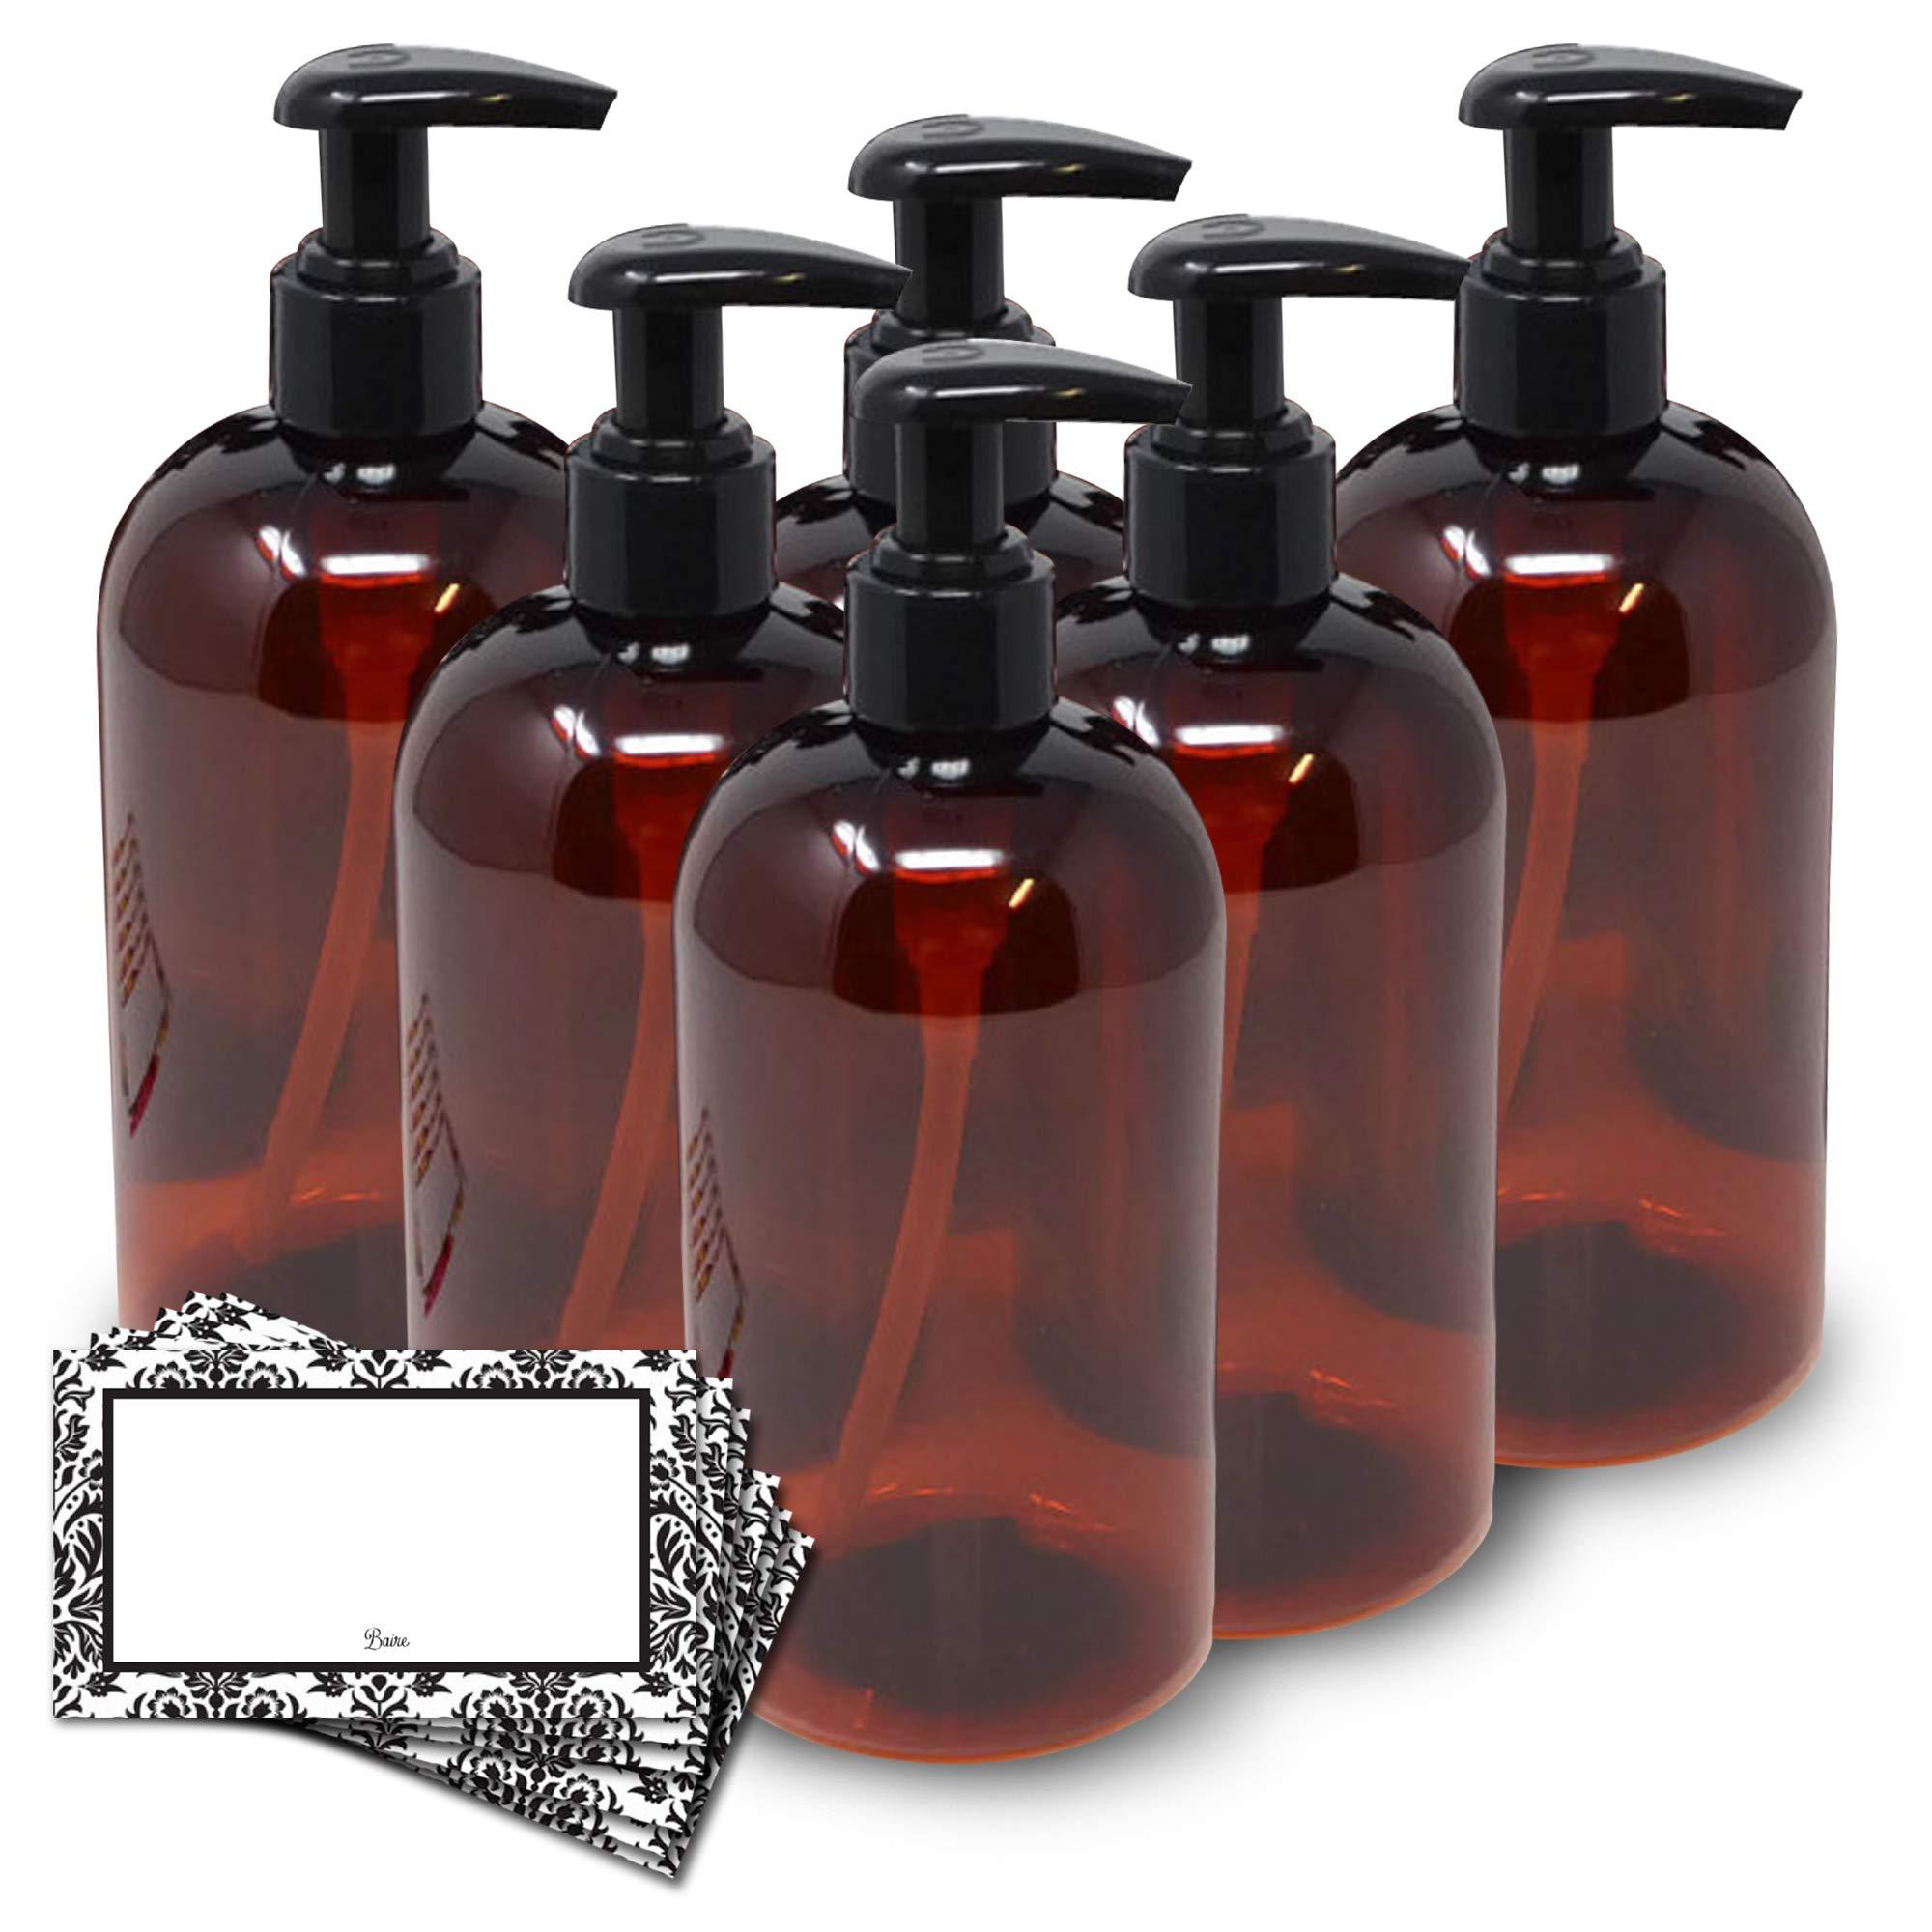 BAIRE BOTTLES - 16 OZ BROWN AMBER PLASTIC REFILLABLE BOTTLE with BLACK LOTION PUMPS - 6 Pack, BONUS 6 DAMASK LABELS - PET, Lightweight, BPA Free - ORGANIZE your Sink and Bath Area